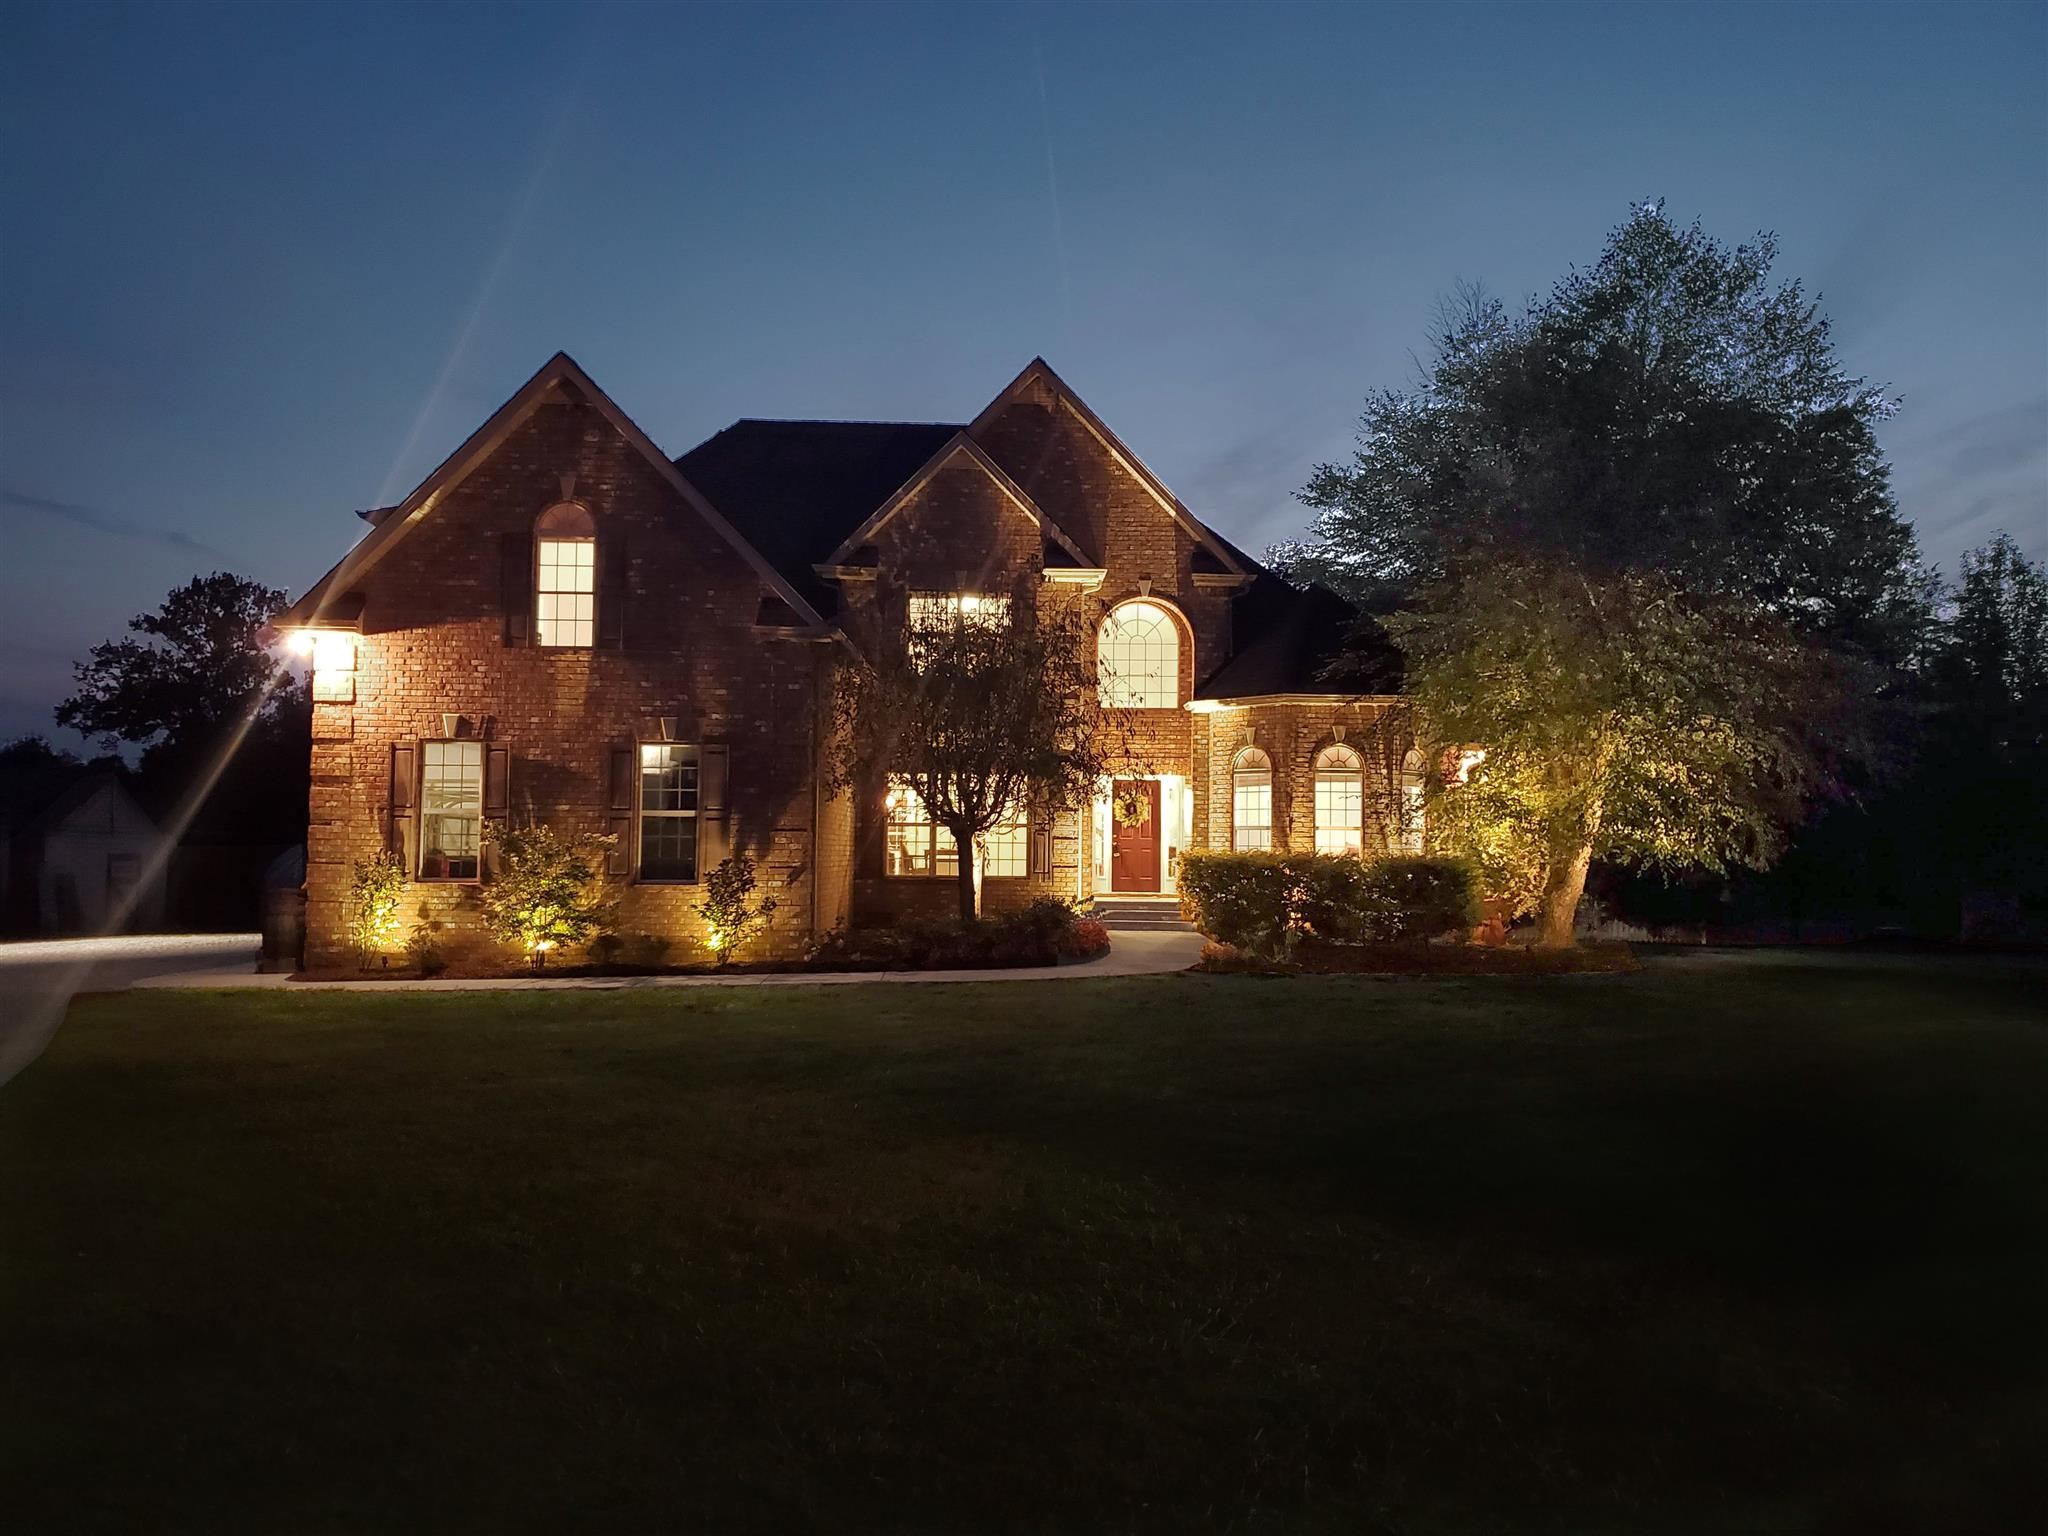 1625 N. Lovvorn Rd, Christiana, TN 37037 - Christiana, TN real estate listing